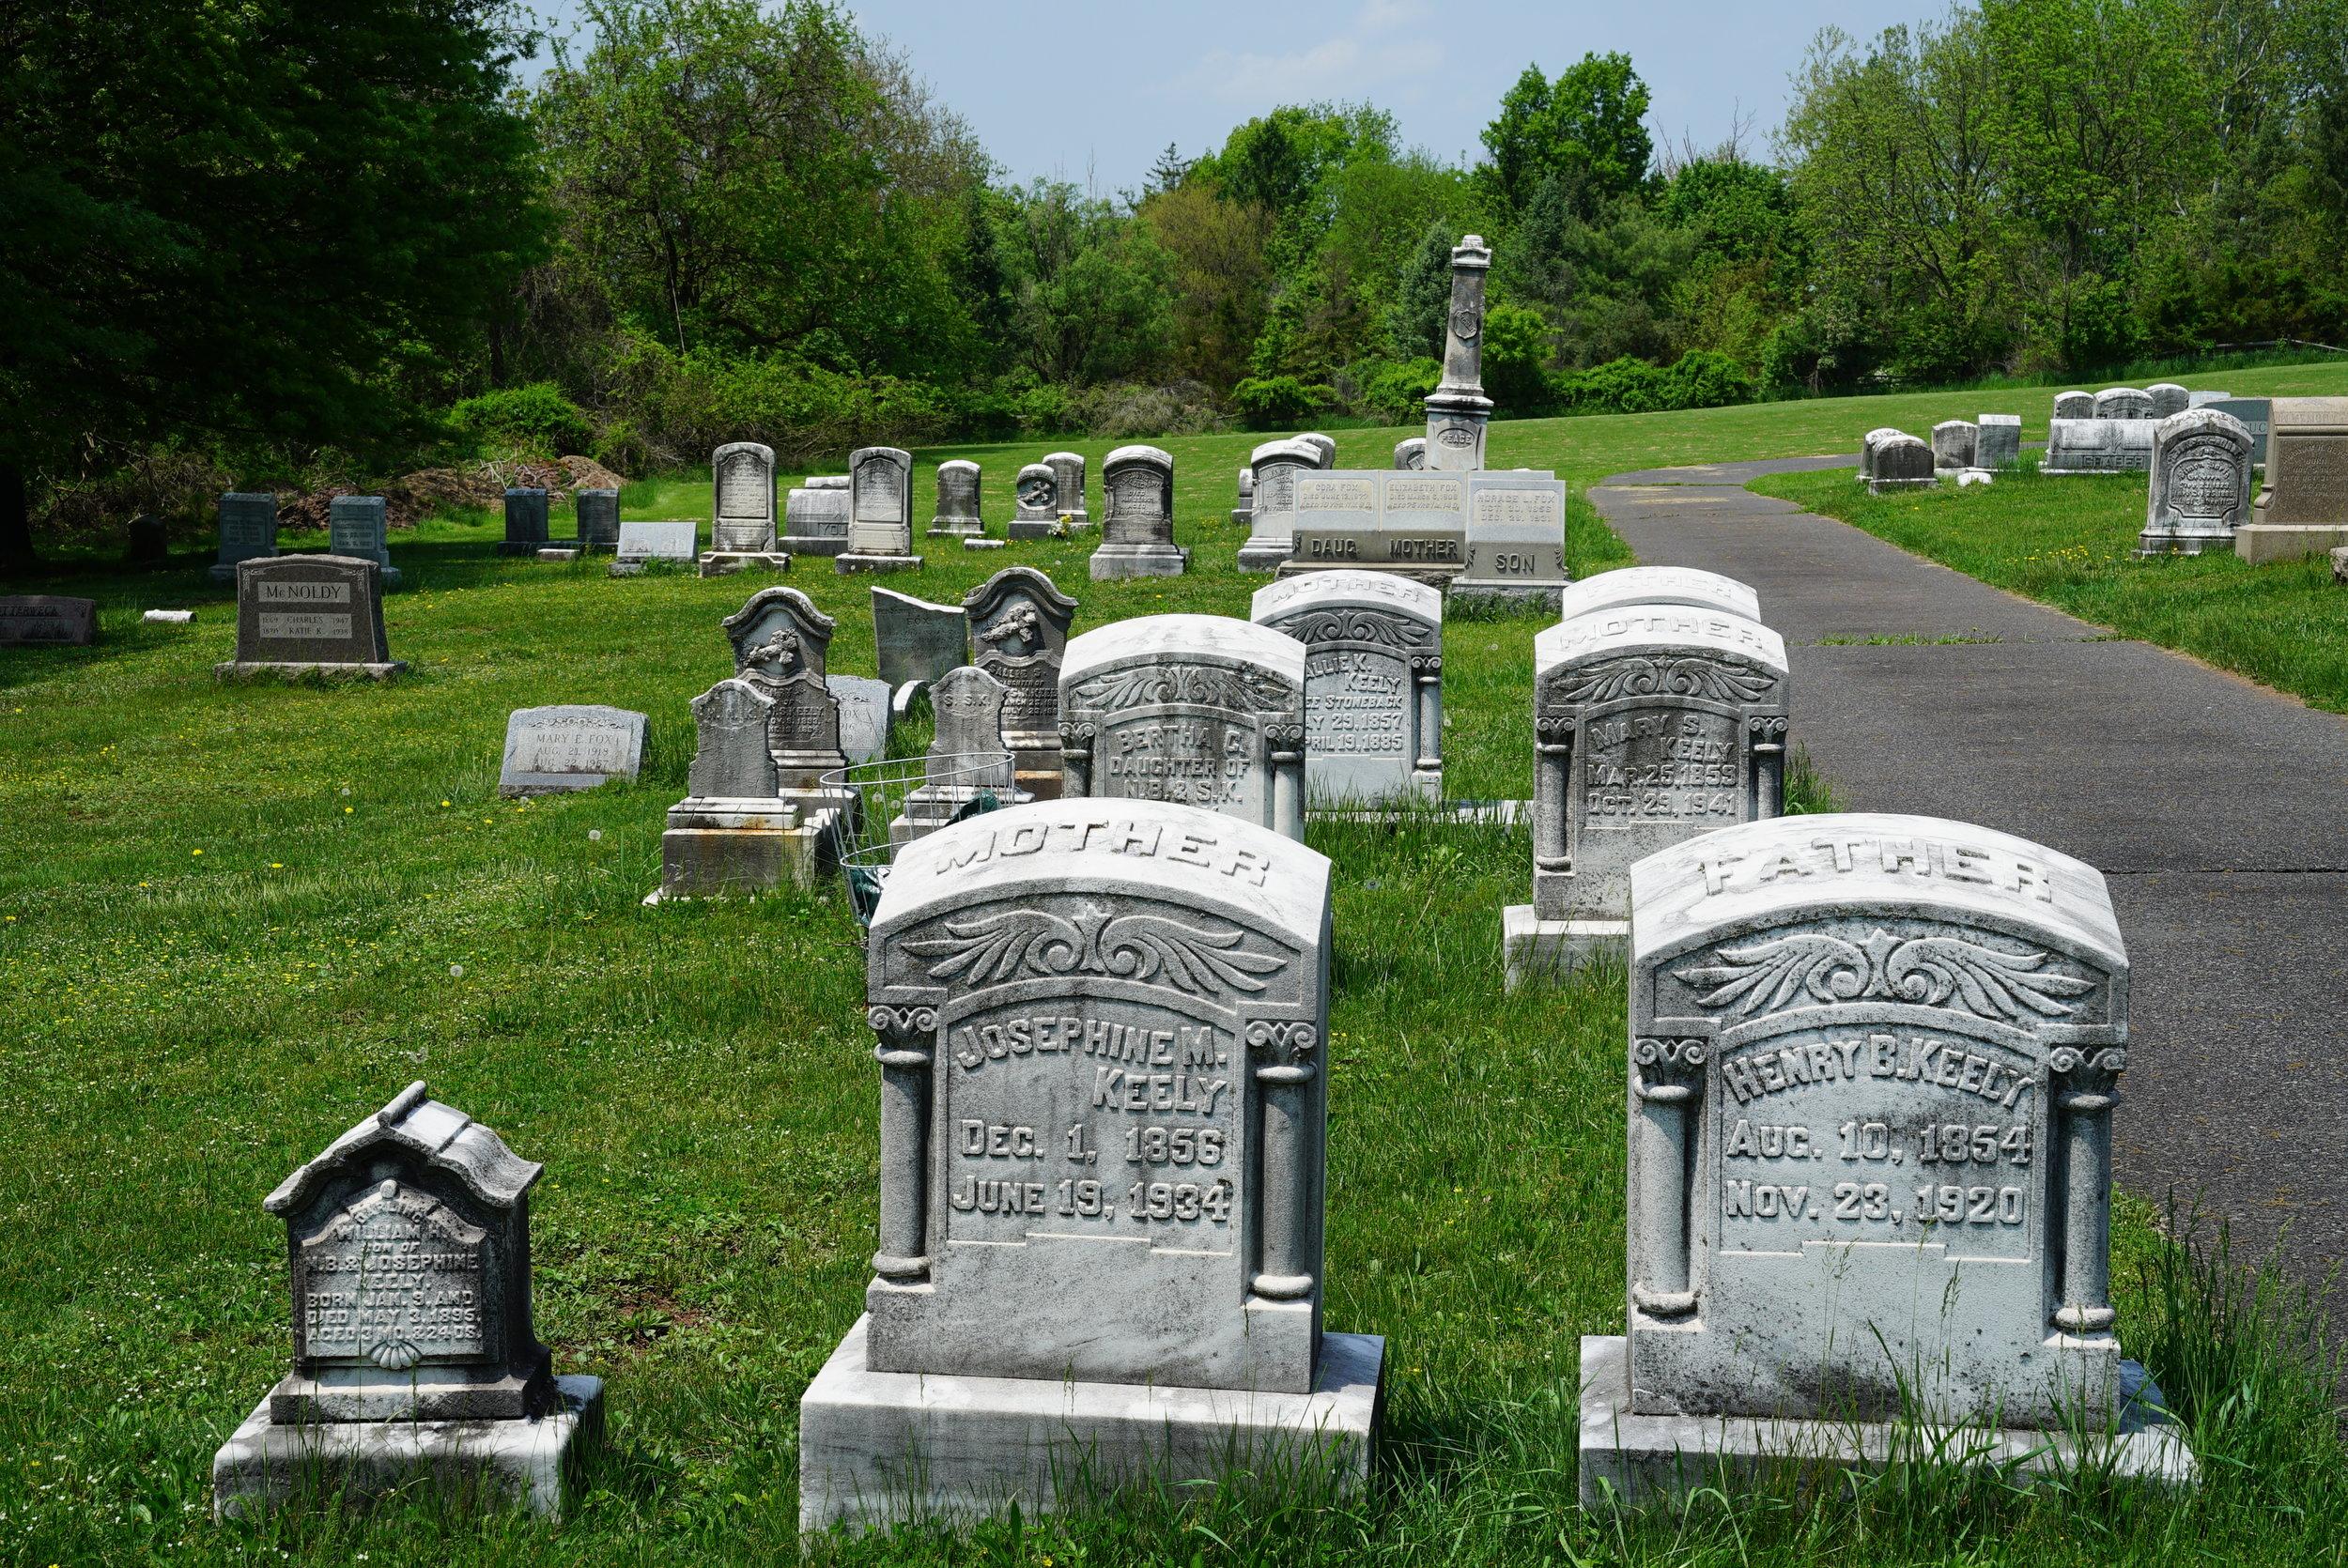 Old tombstones. Pennsburg United Church of Christ Cemetery. Pennsburg, Pennsylvania.